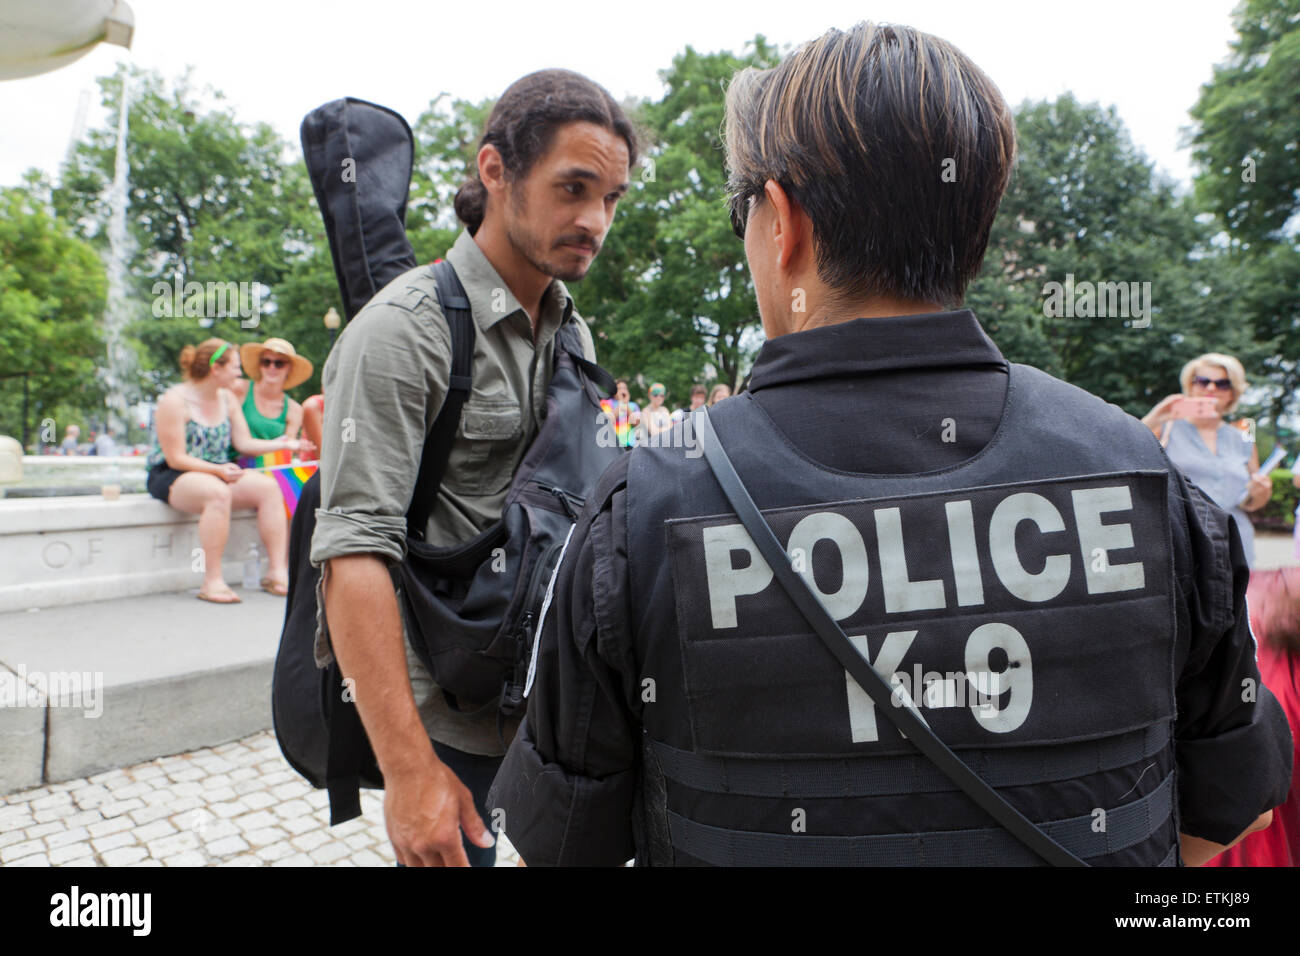 K-9 Police talking with citizen - Washington, DC USA - Stock Image